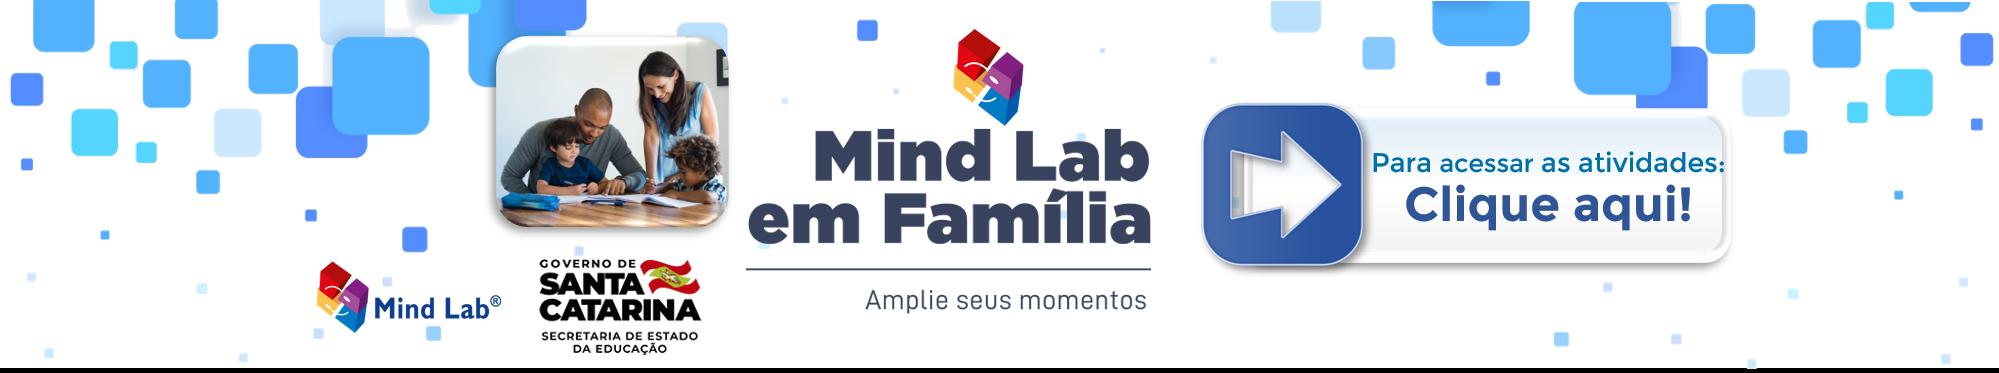 Banner_MLemfamiliaSC